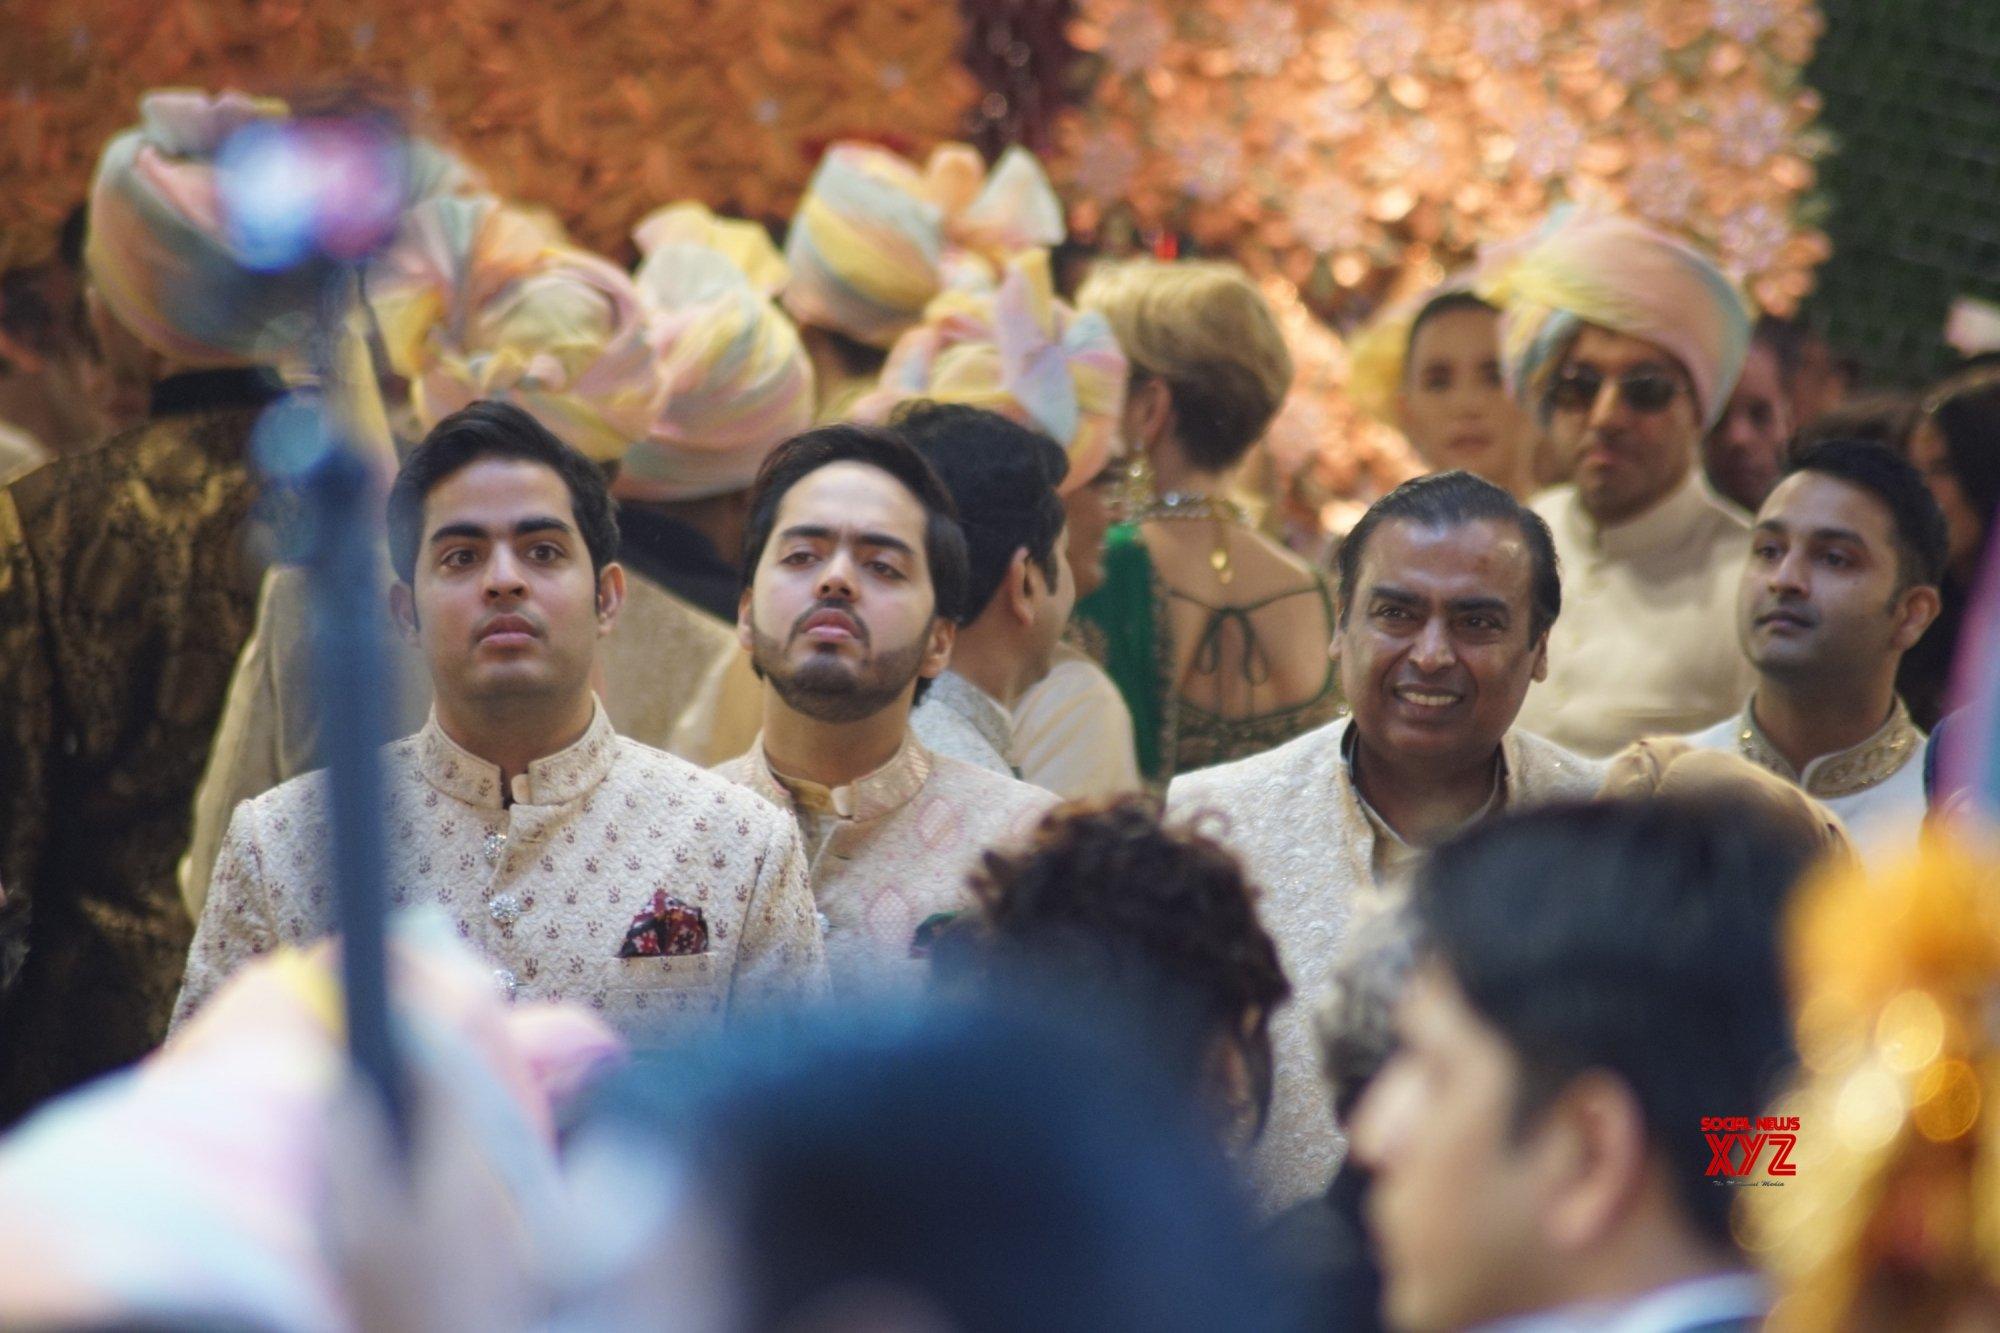 Regal wedding for corporate scions Isha Ambani and Anand Piramal dazzles Mumbai